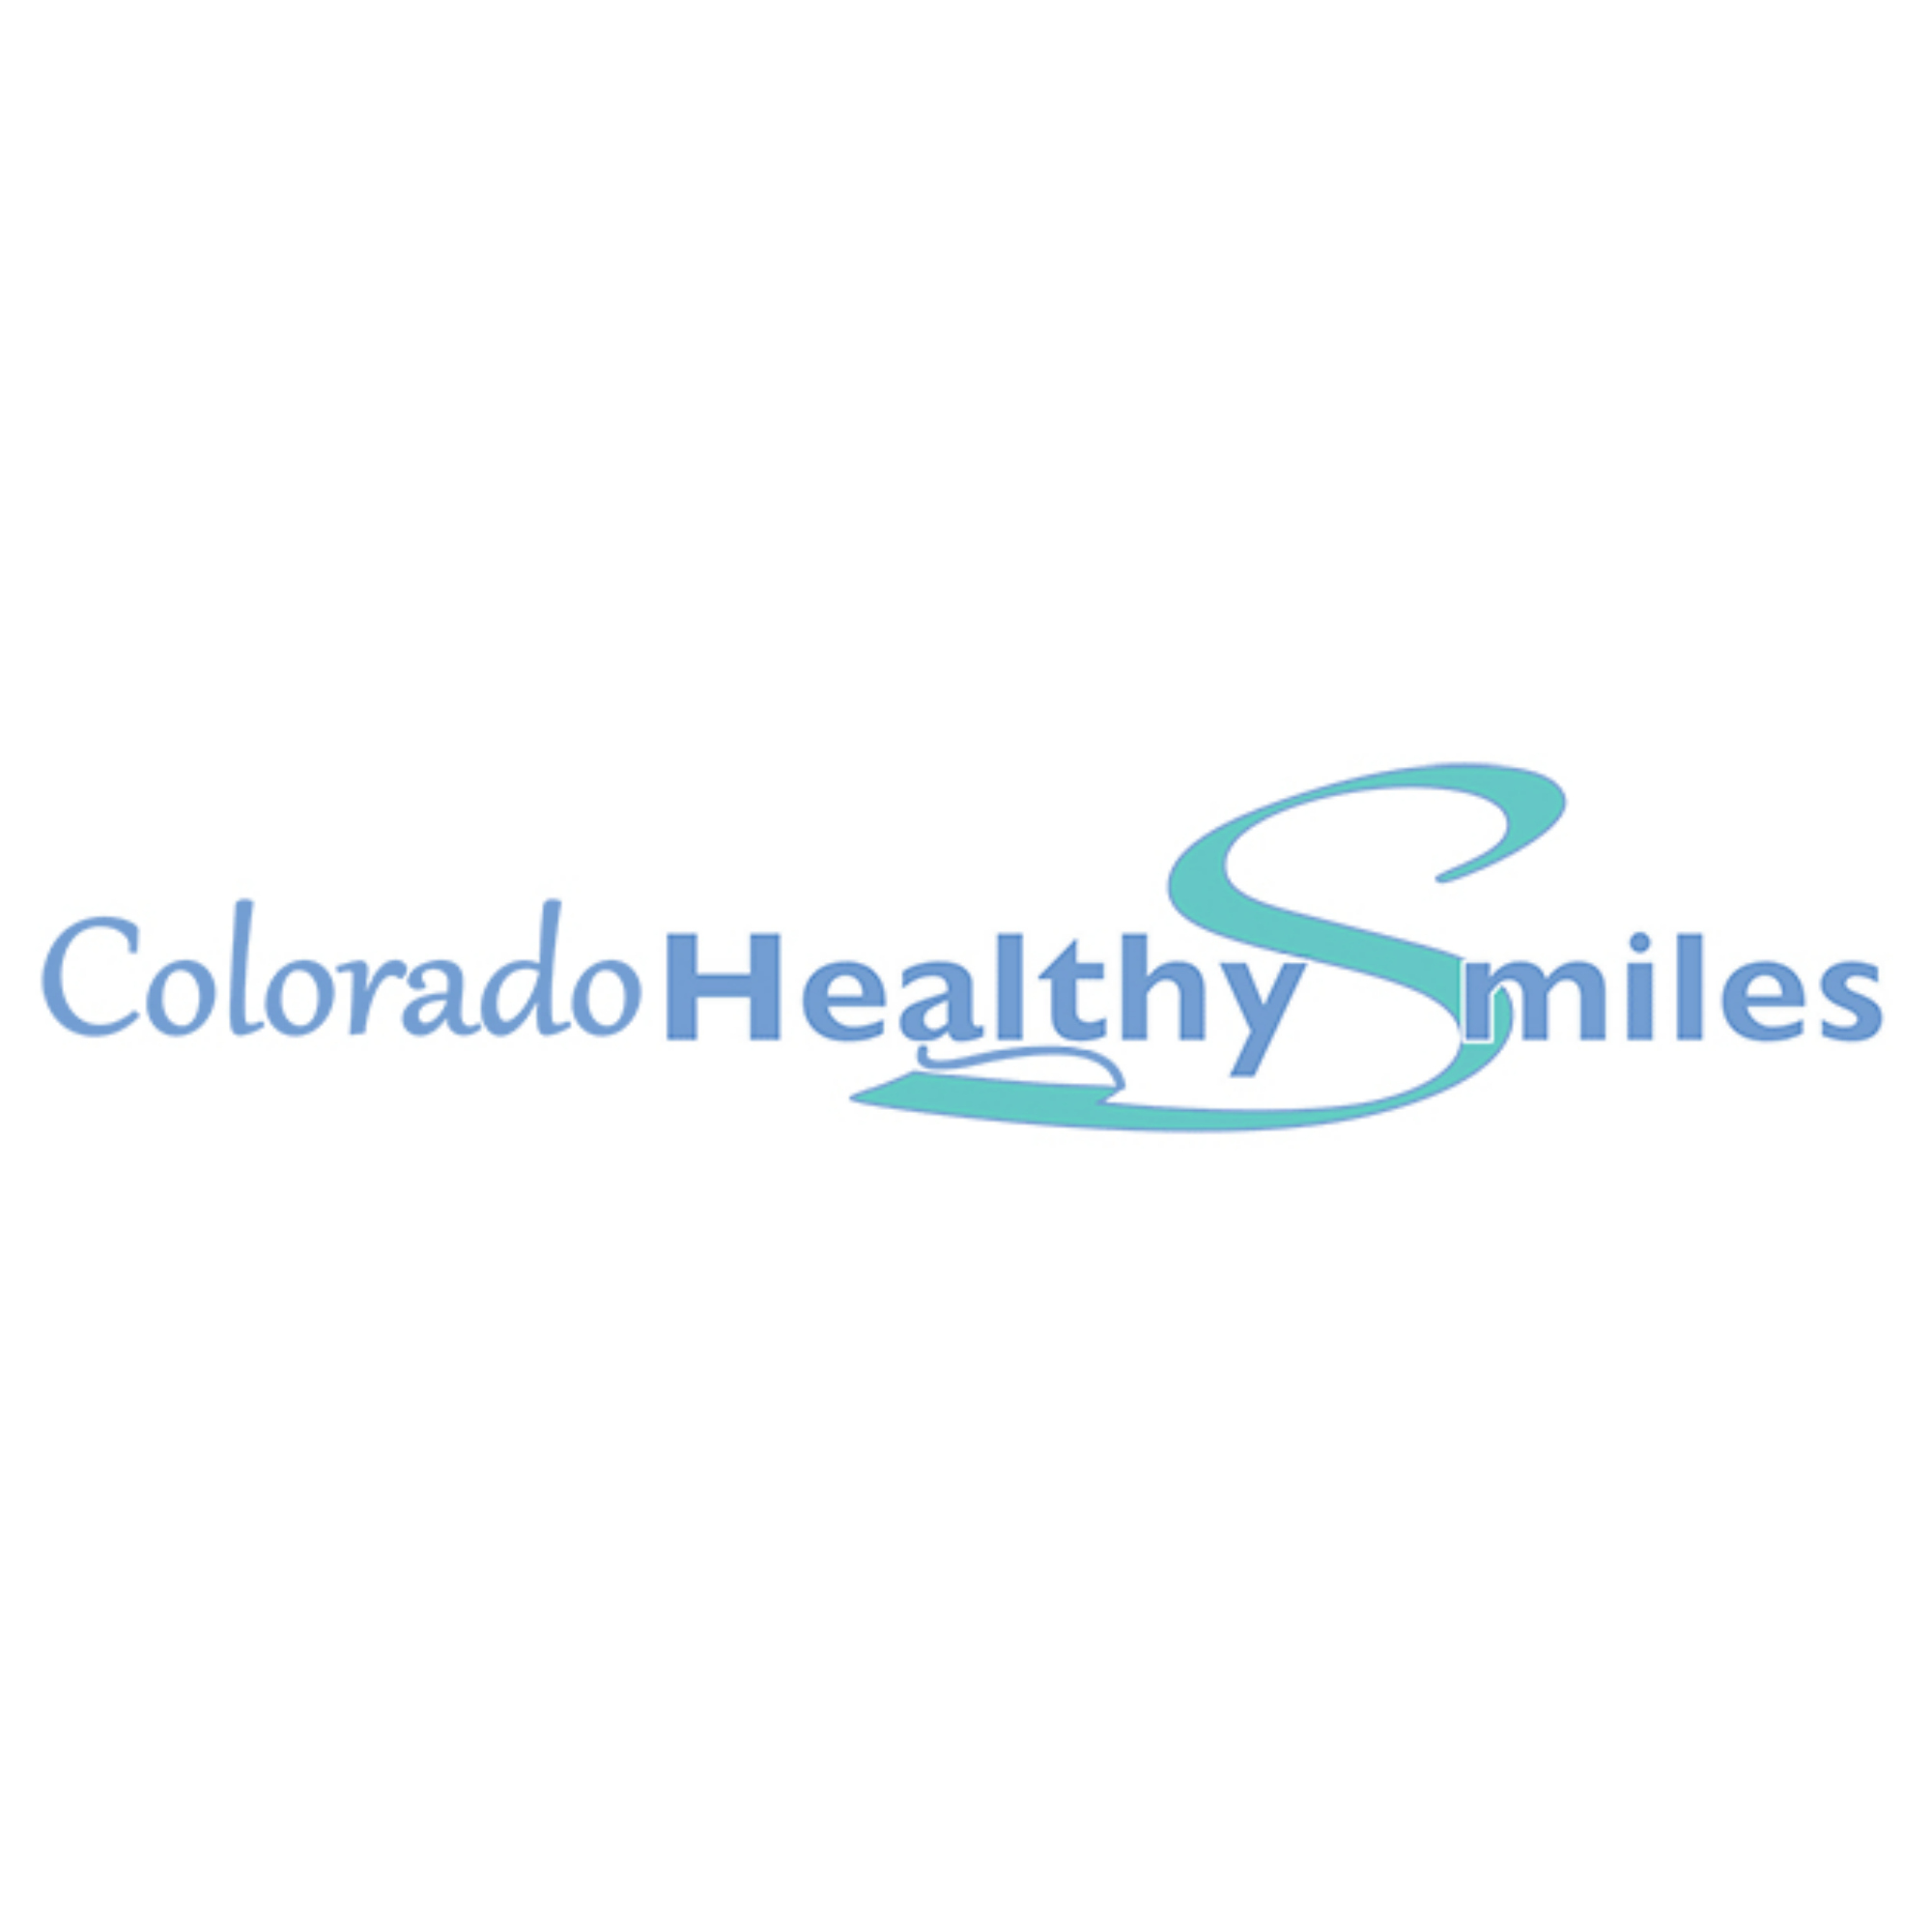 Colorado Healthy Smiles - Lafayette, CO 80026 - (303)469-3344 | ShowMeLocal.com